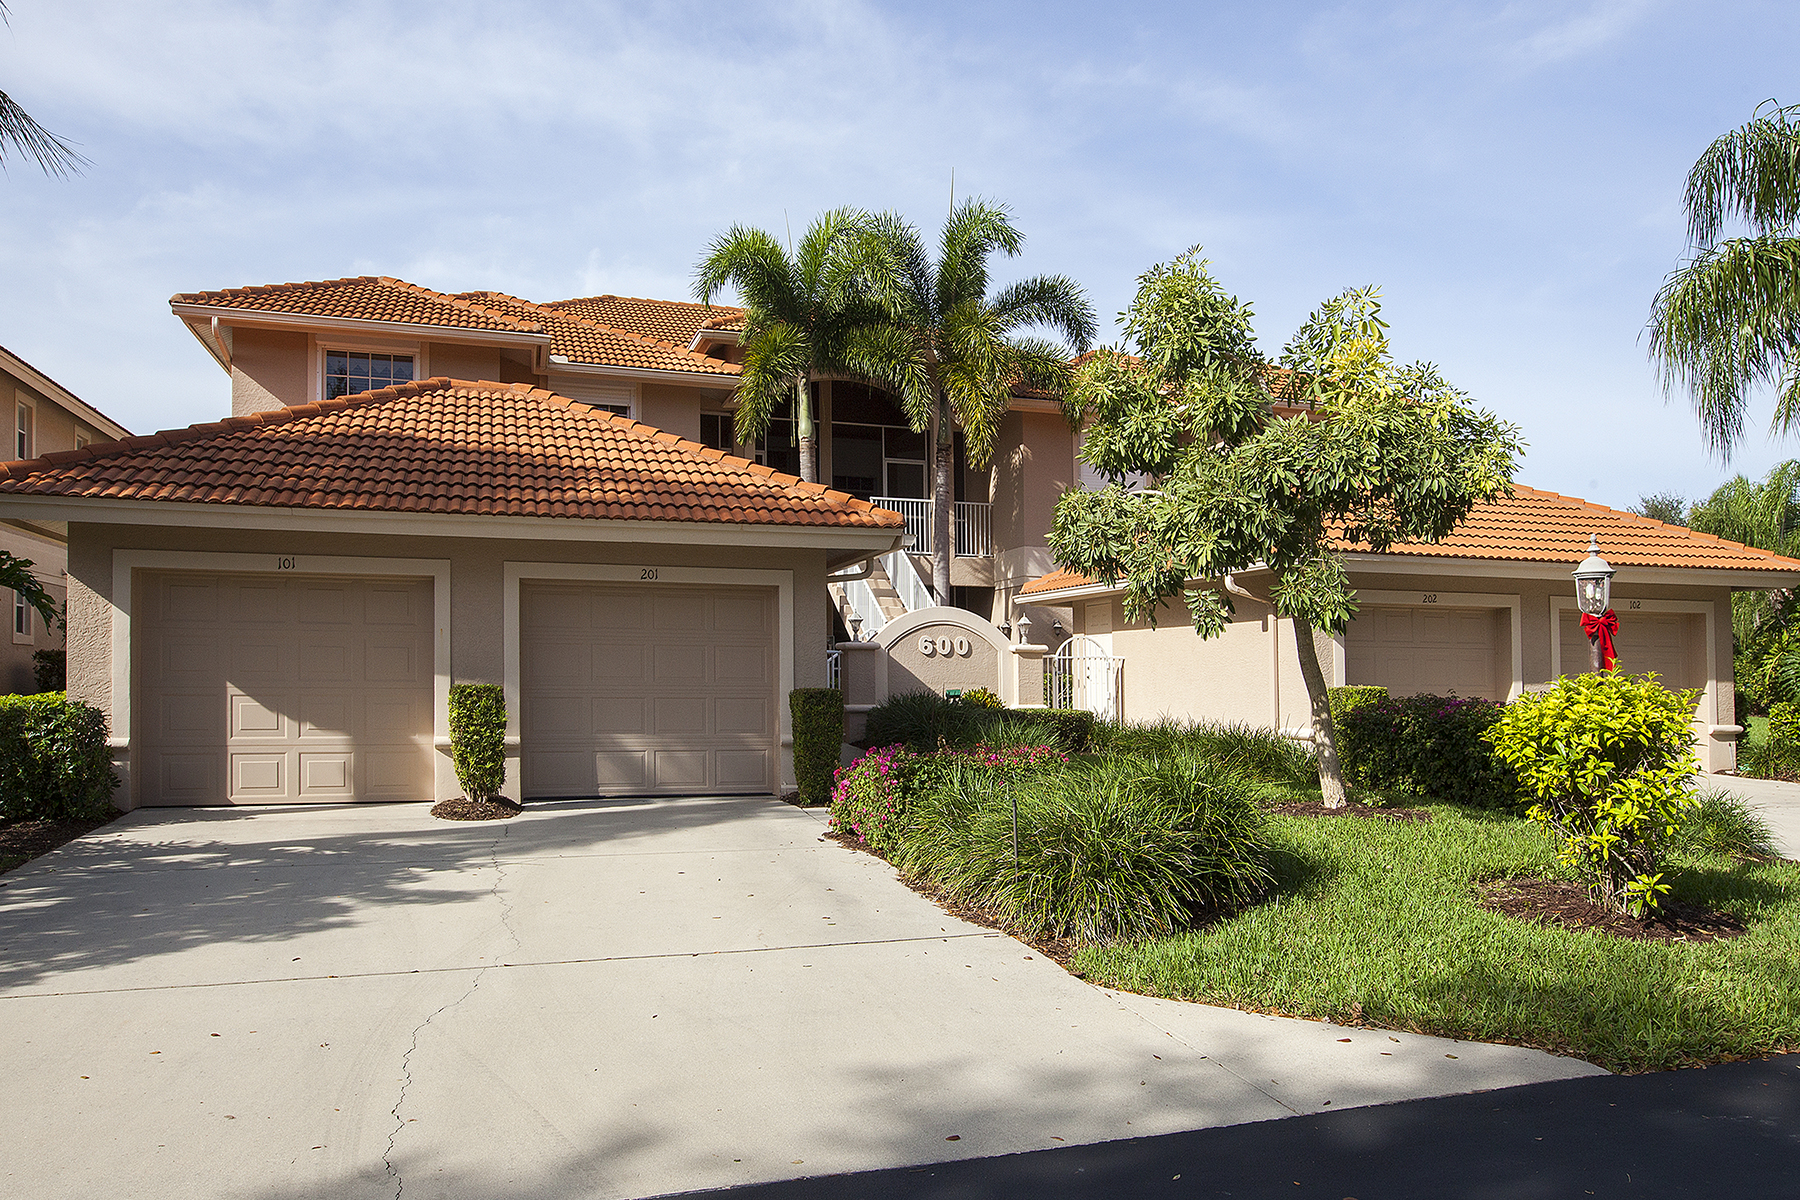 Condominium for Sale at CLUB MARCO - CLUB MARCO 600 Club Marco Cir 201 Marco Island, Florida, 34145 United States